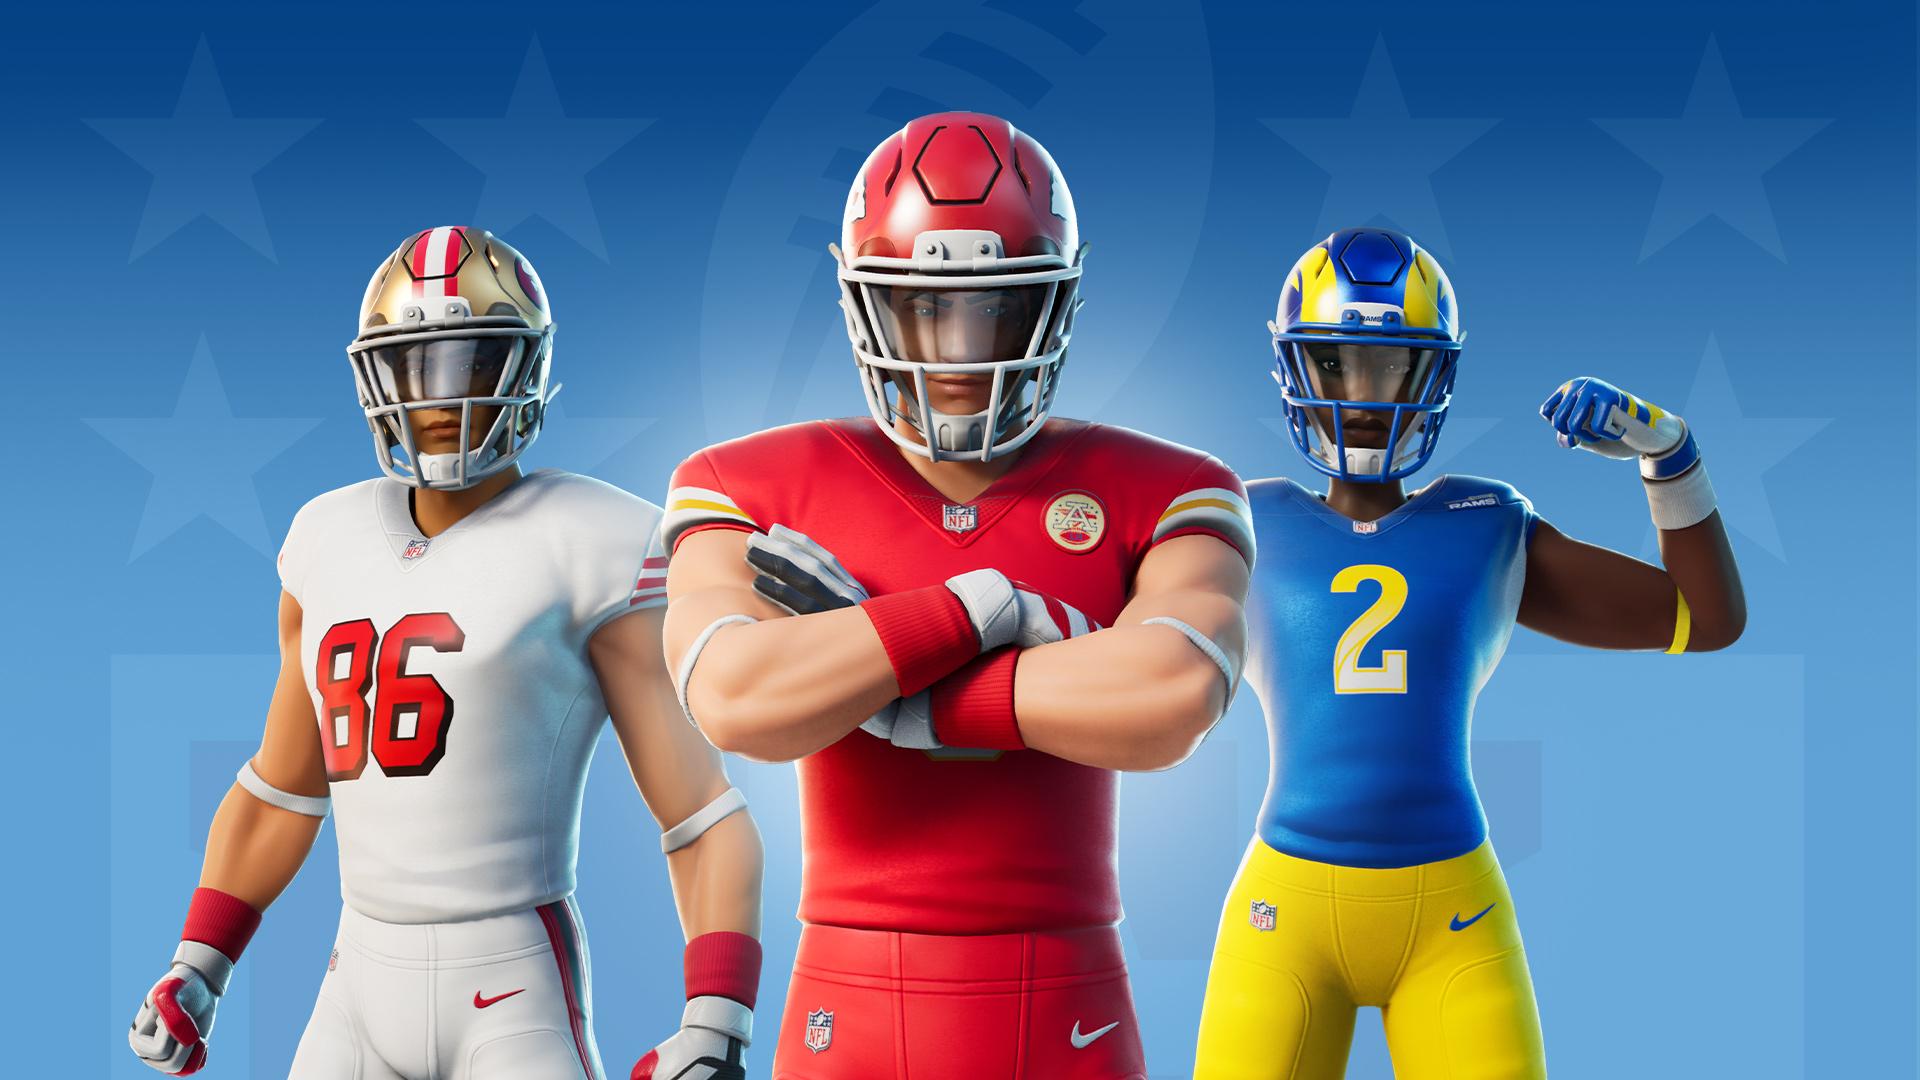 2020 NFL Gridiron Gang icon